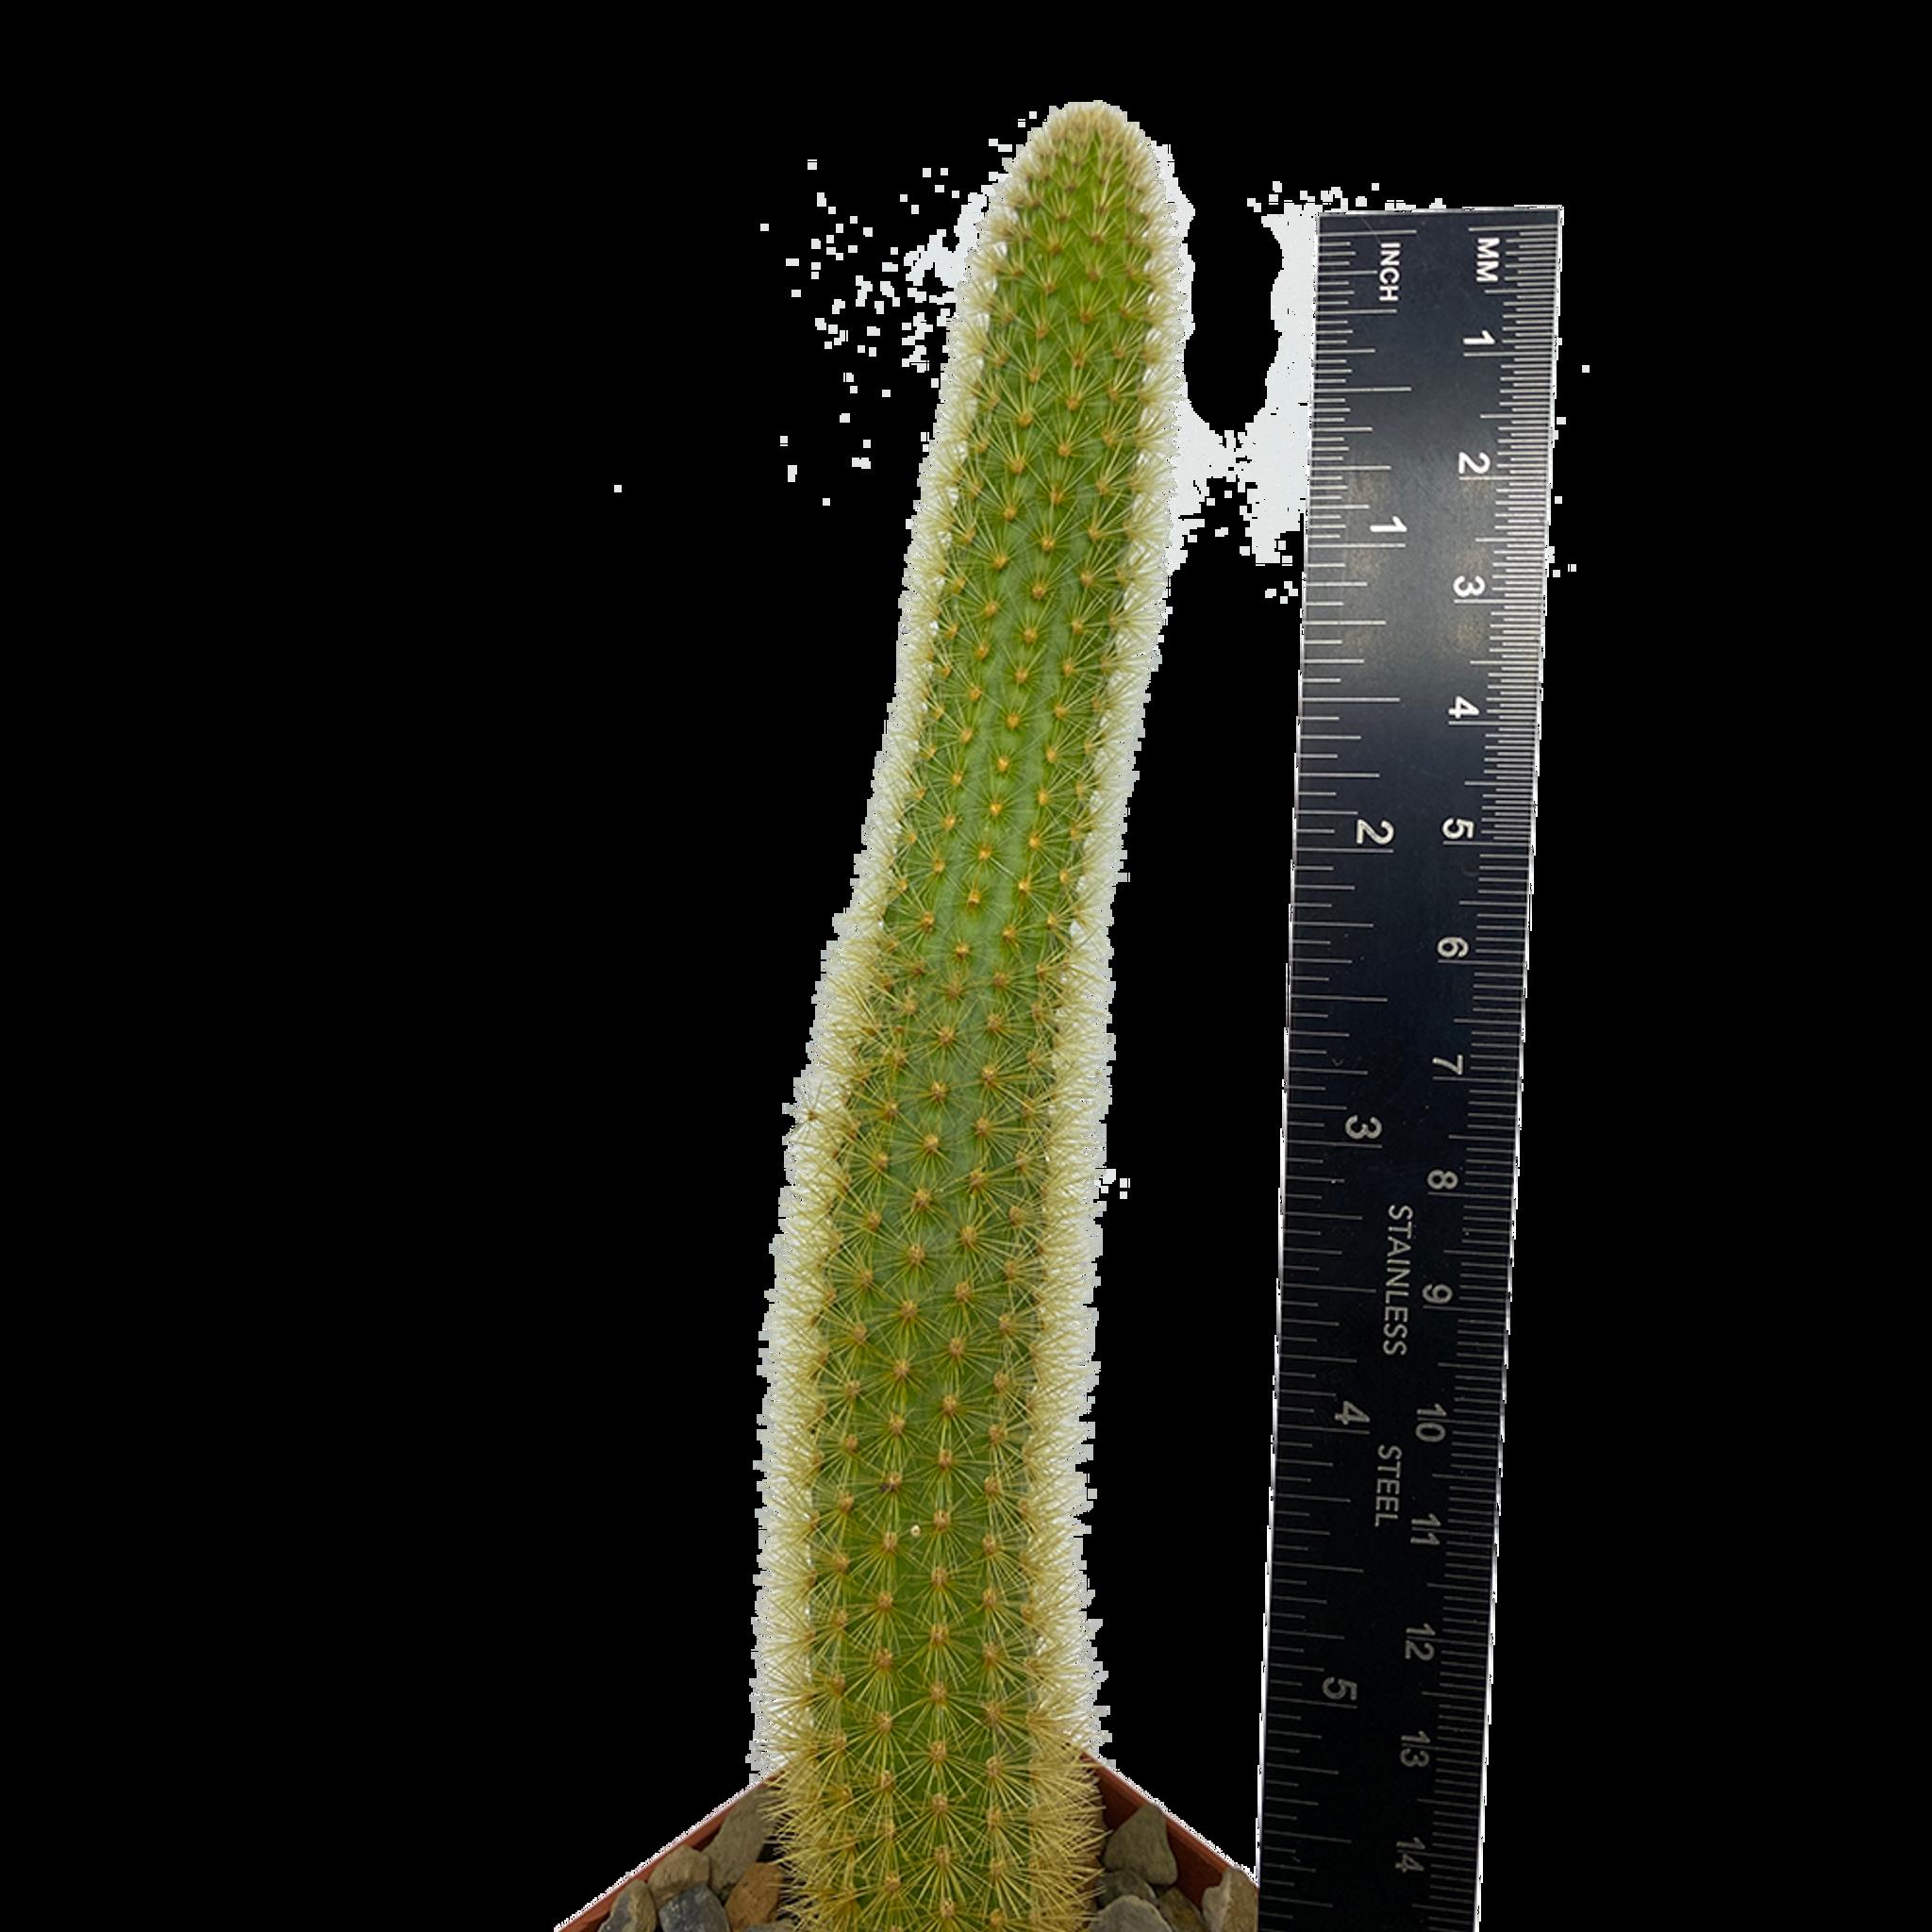 Cleistocactus winteri 'Golden Rat Tail'